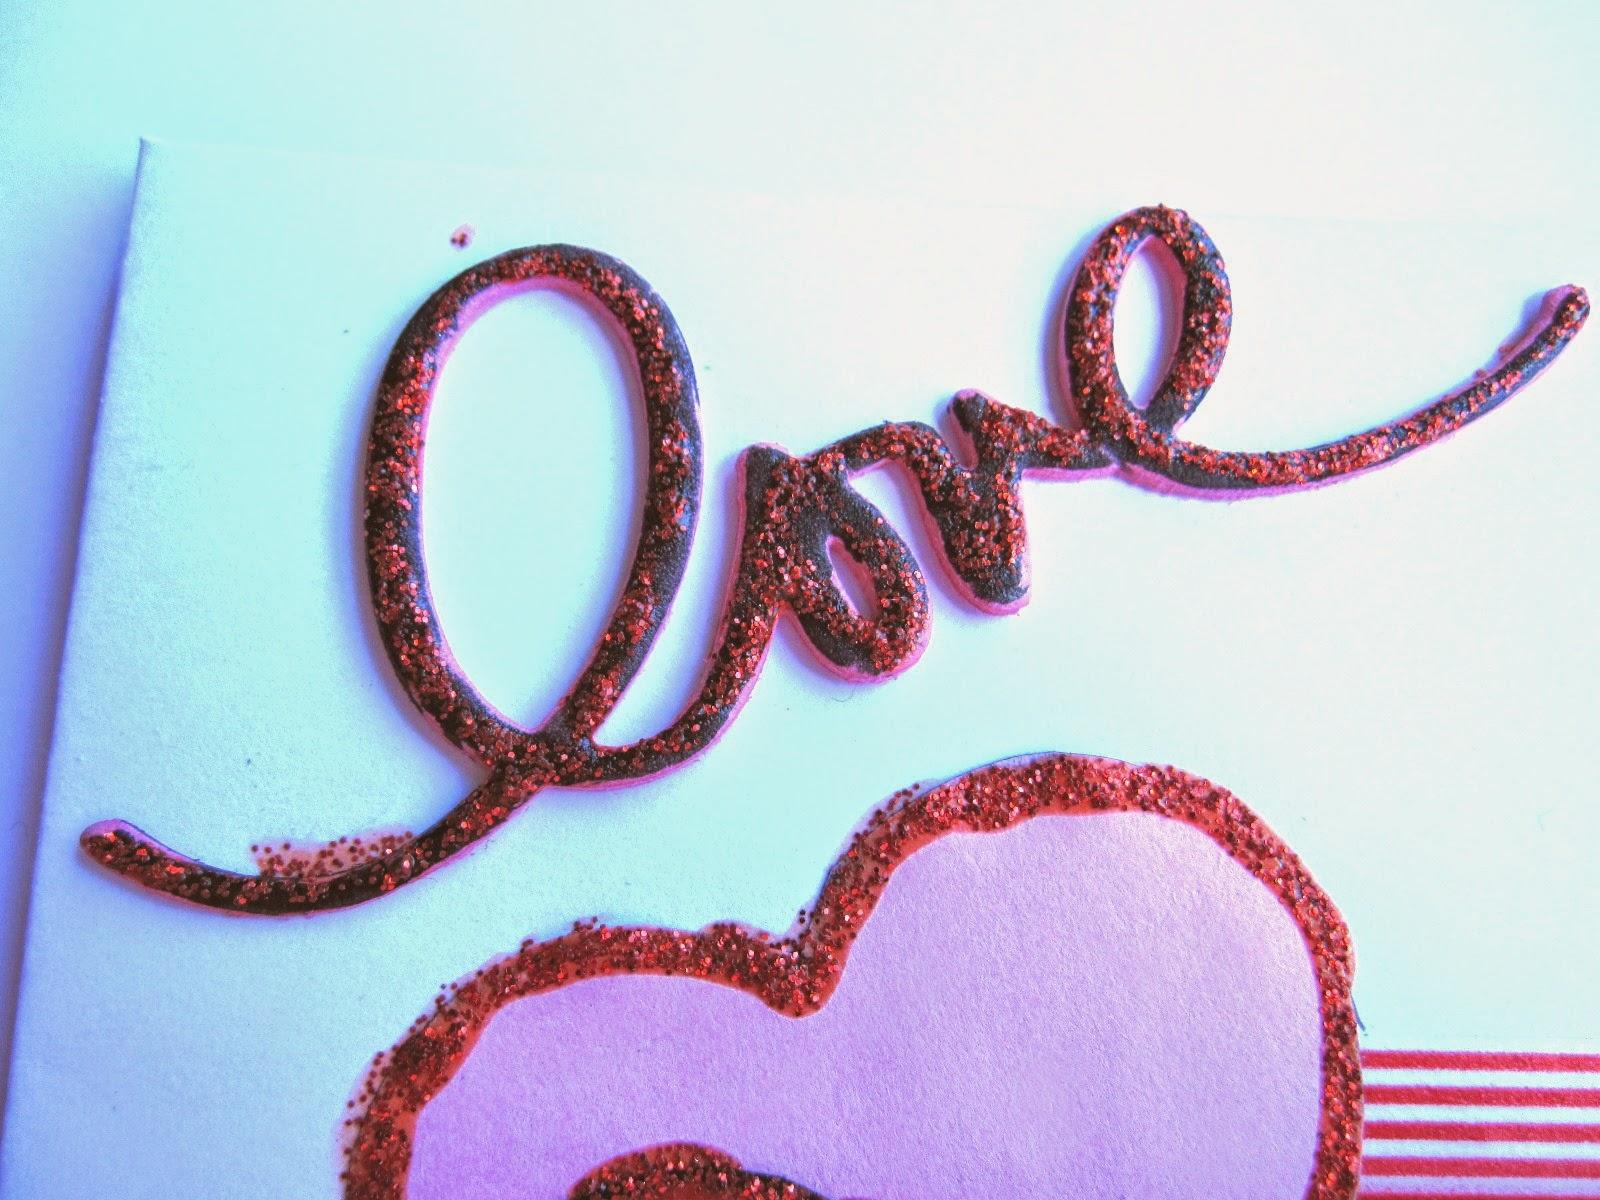 detalle tarjeta scrapbooking de San Valentin con la palabra LOVE negra y resaltada con glitter glue rojo